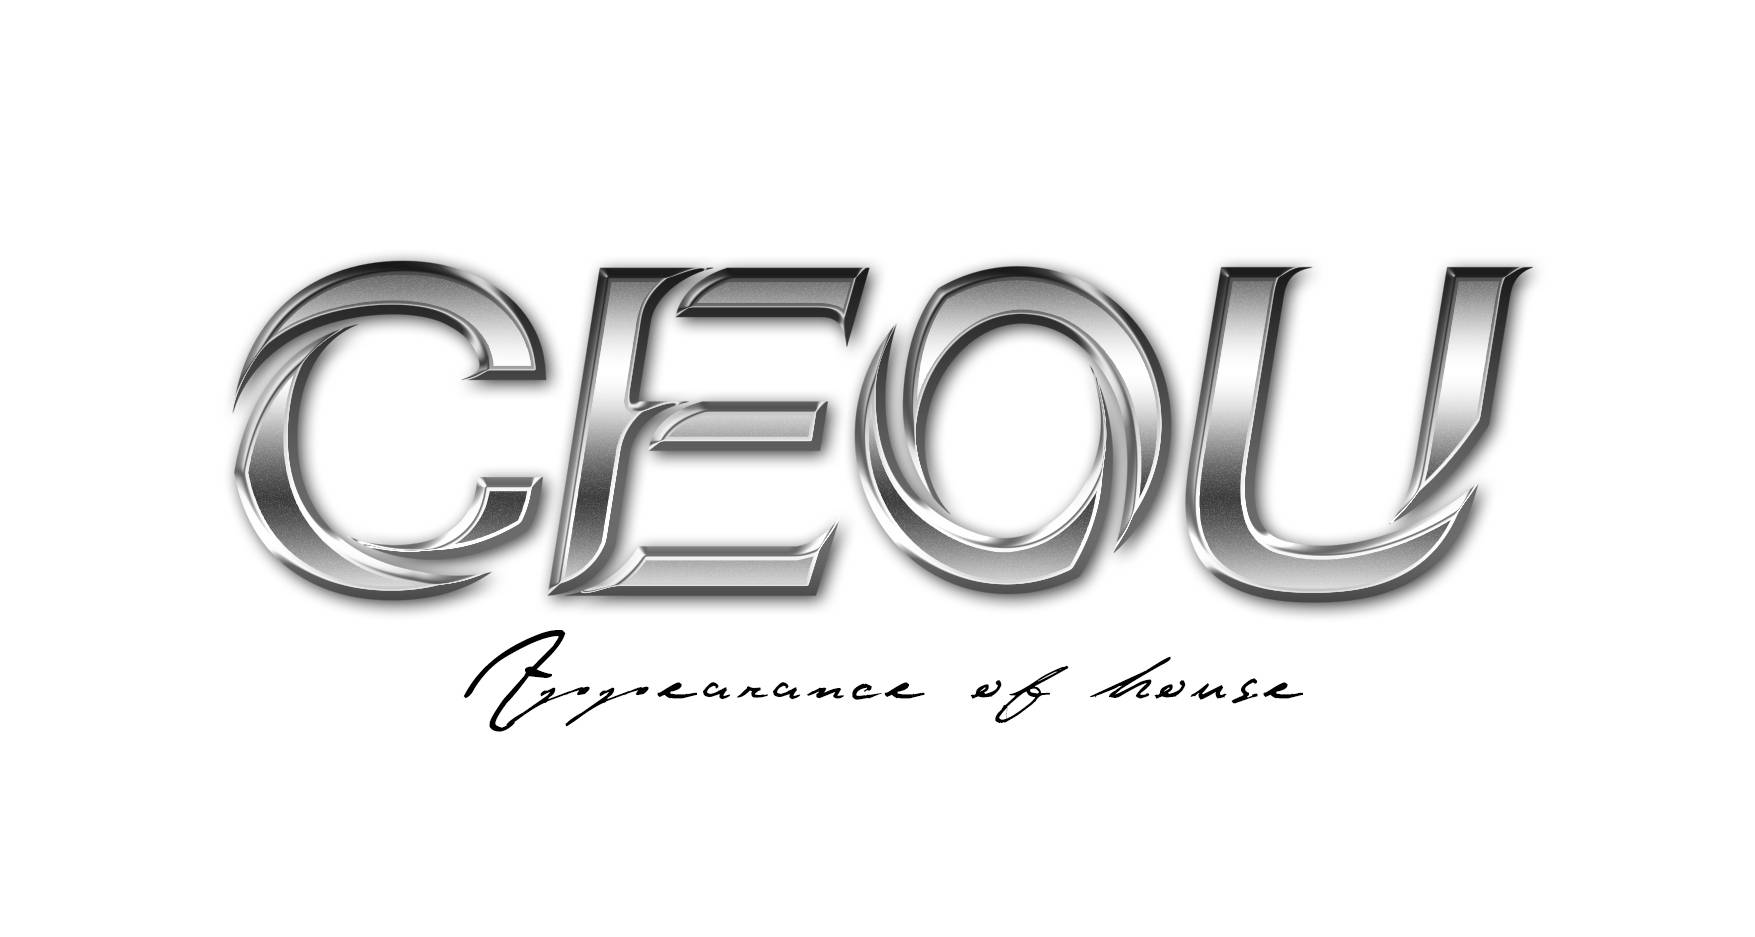 CEOU Array image53